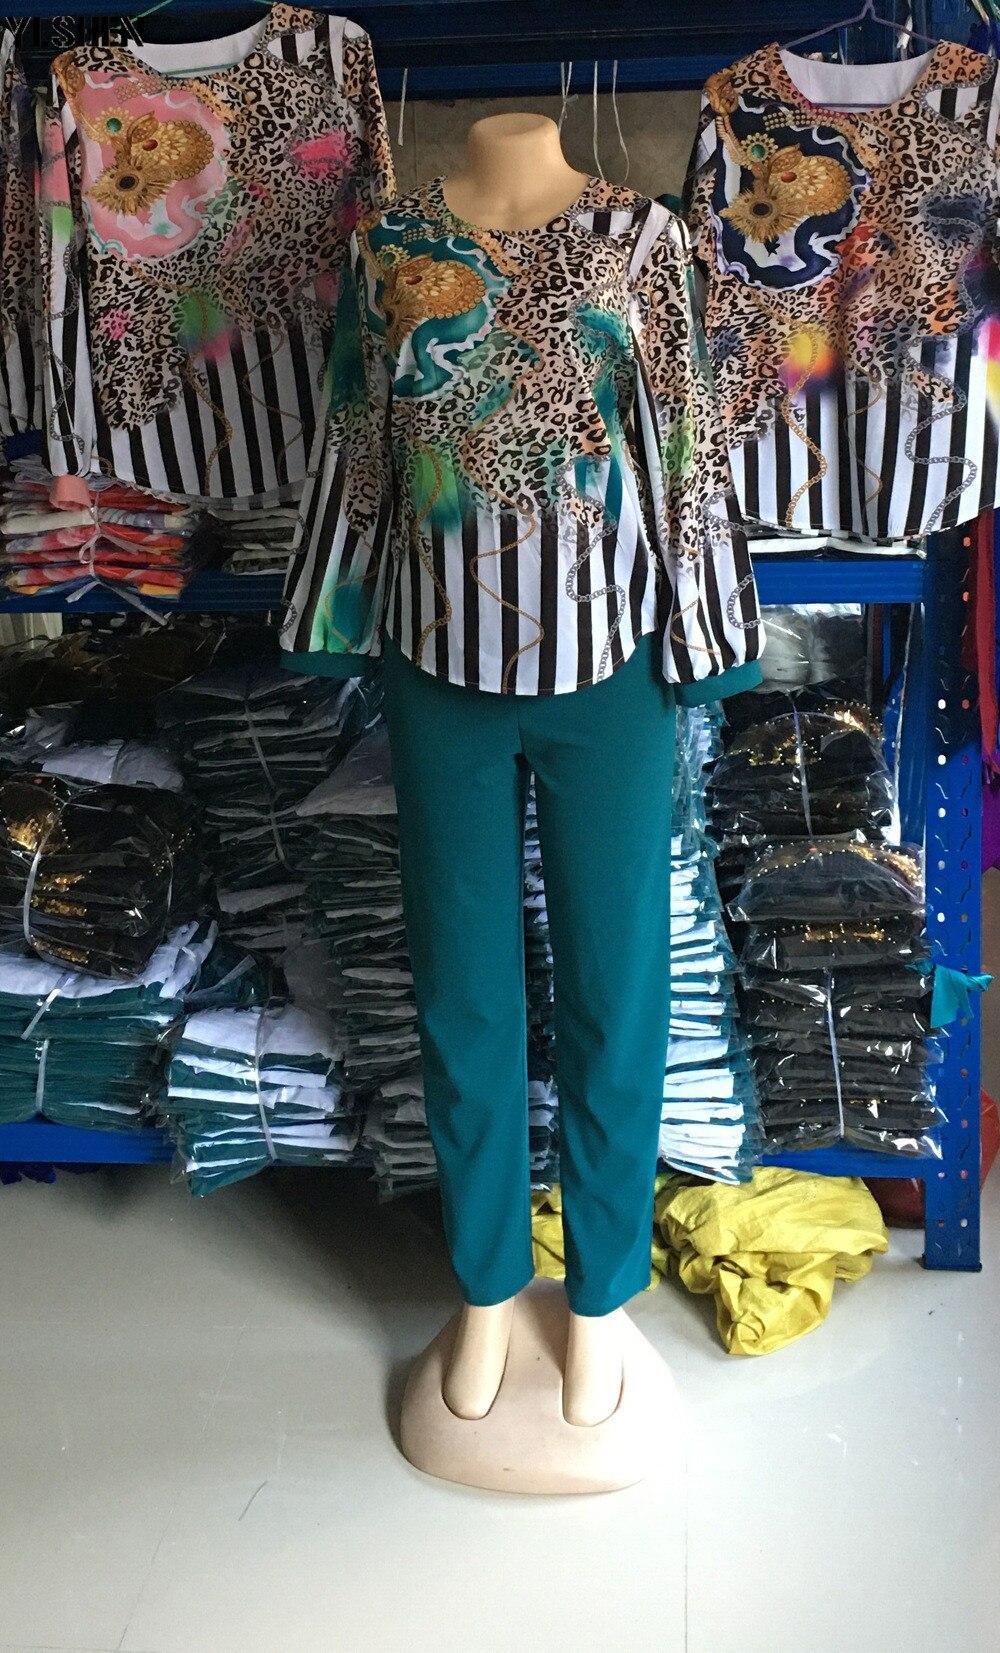 Two 2 Piece Set African Clothes Africa 2020 Dashiki Fashion Print Dresses Suit Bazin Top Pants Elastic Party Plus Size Clothing 12